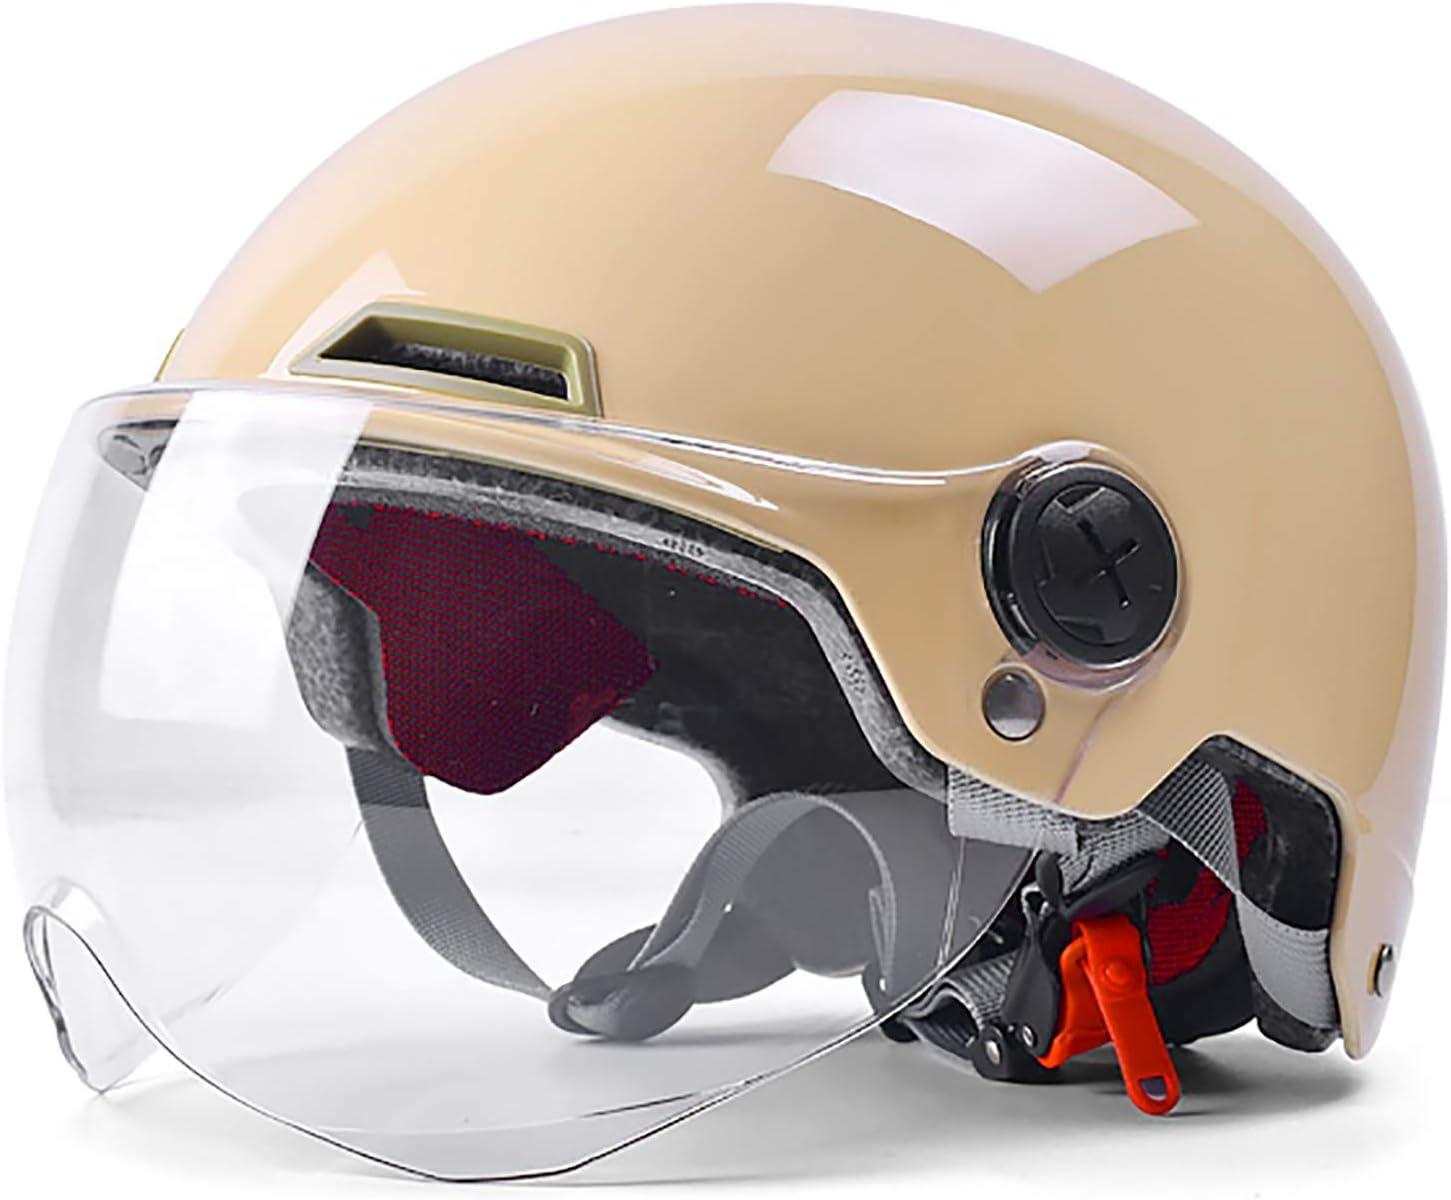 FCHMY Casco Moto Jet Abierto Retro Cascos Half-Helmet ECE Homologado Ciclomotor Scooter Bicicleta Mofa Piloto Crash Cruiser Chopper Racing Cap con Doble Visera Casco Moto Jet 55-62cm: Amazon.es: Hogar